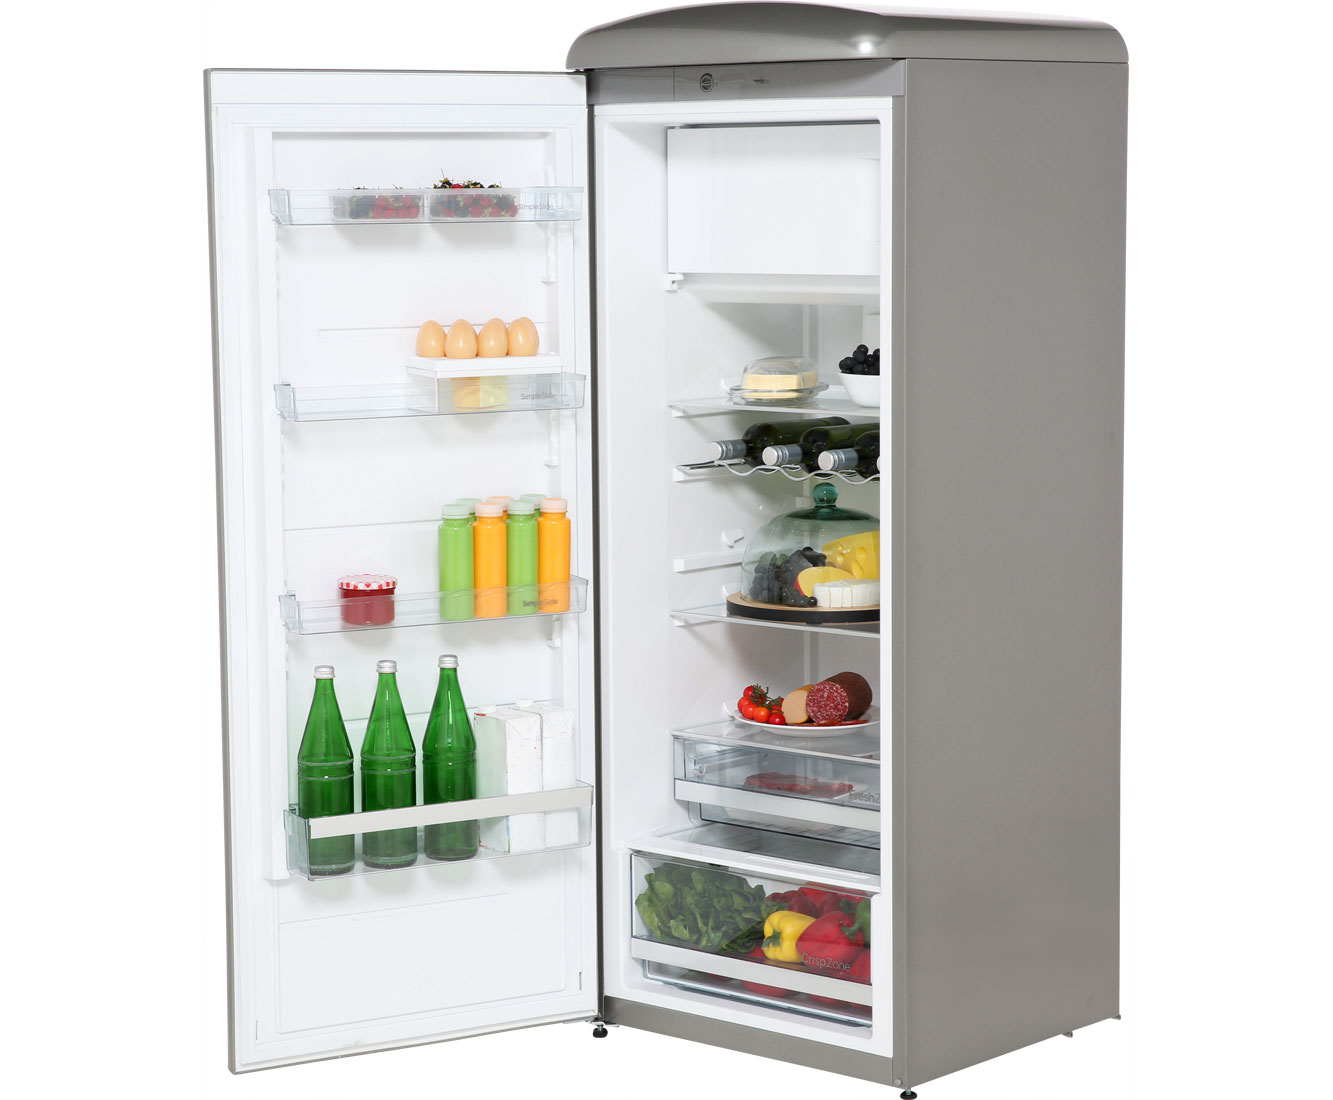 Gorenje Kühlschrank Creme Retro : Kühlschrank freistehend retro retro minikühlschrank 95l rot 2türig